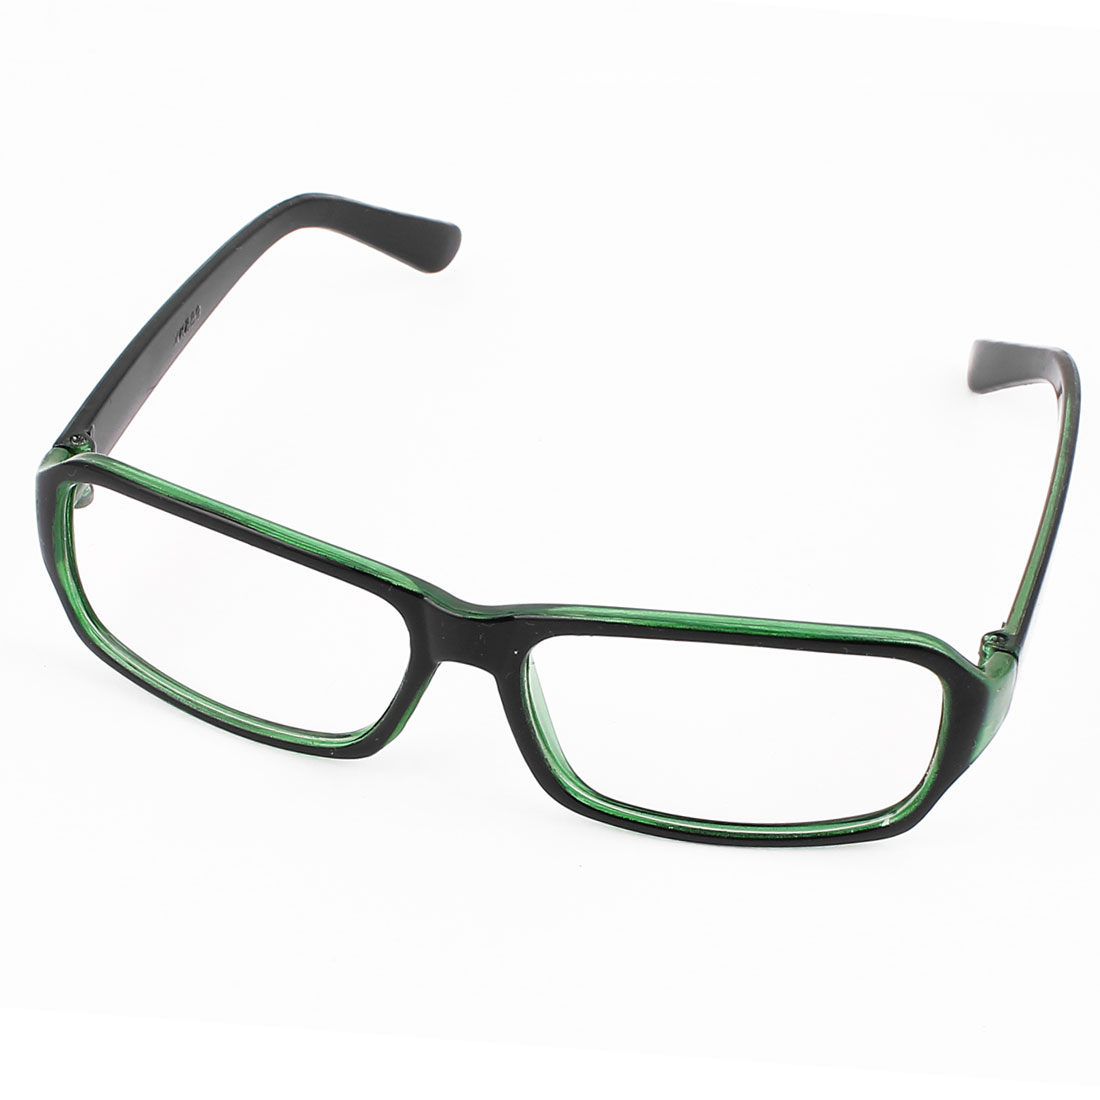 Unisex Plastic Full Rim Single Bridge Plano Glasses Spectacles Black Green